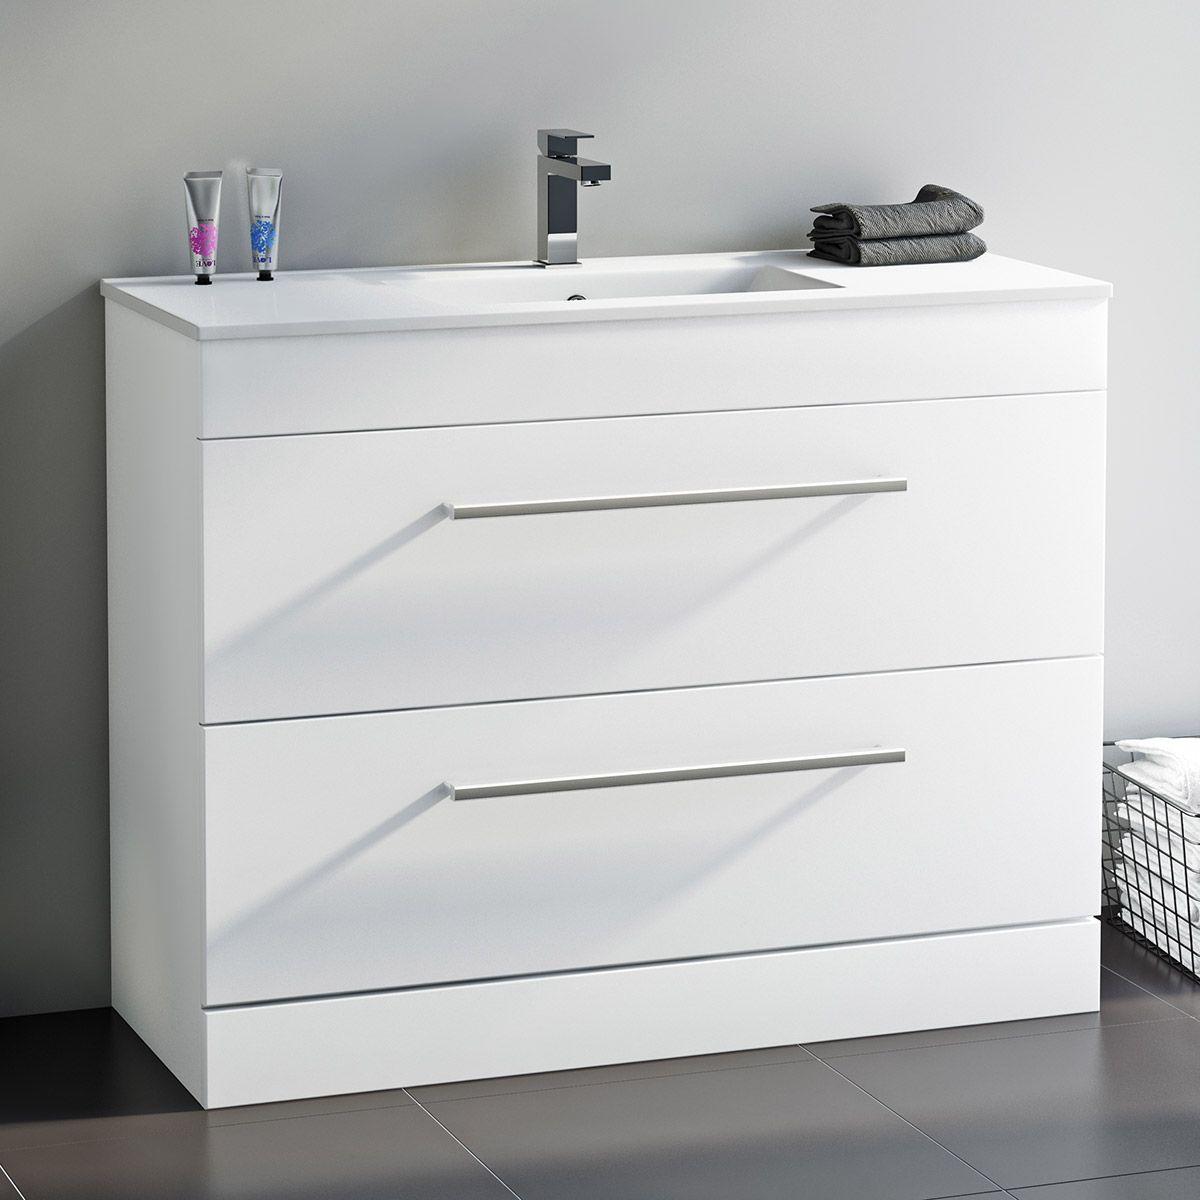 Orchard Derwent White Floorstanding Vanity Unit And Ceramic Basin